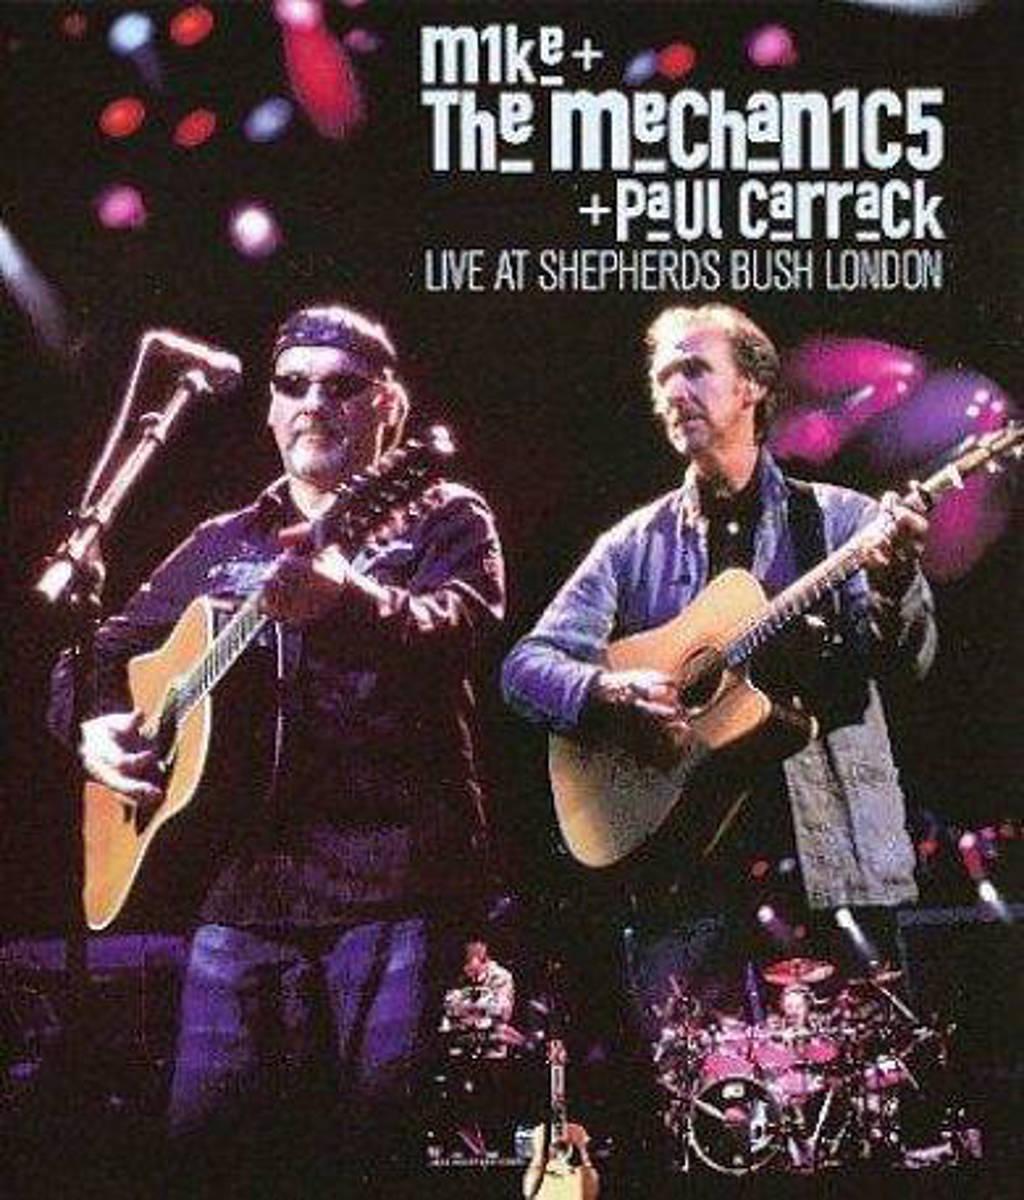 Mike & The Mechanics - Live At Shepherds Bush (Blu-ray)